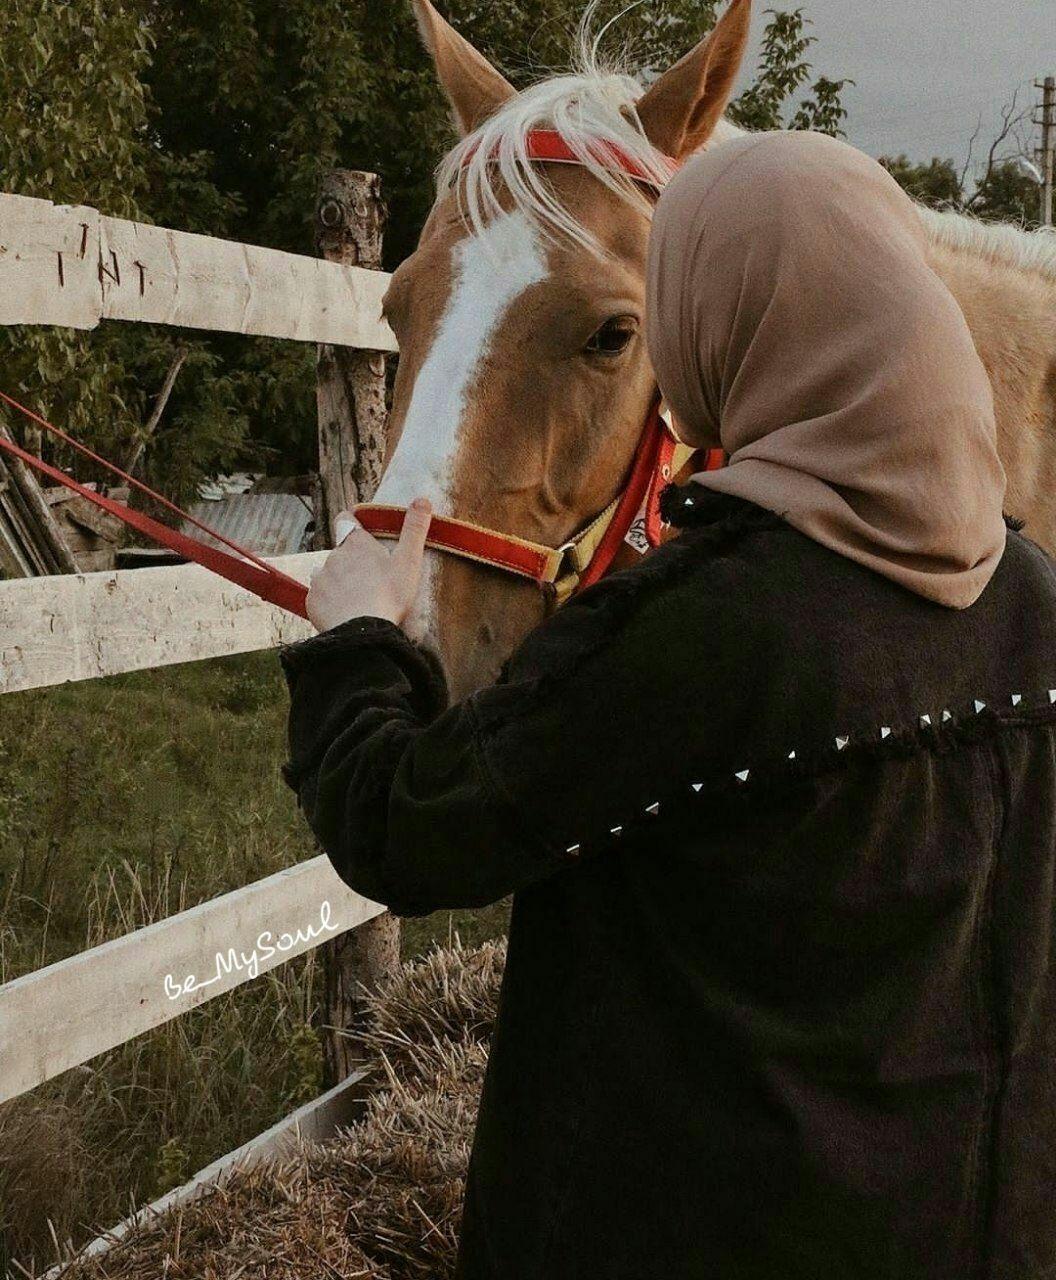 Pin By منى الحربي On أجمل الخلفيات للبرامج Photography Inspiration Portrait Ideas For Instagram Photos Horse Girl Photography